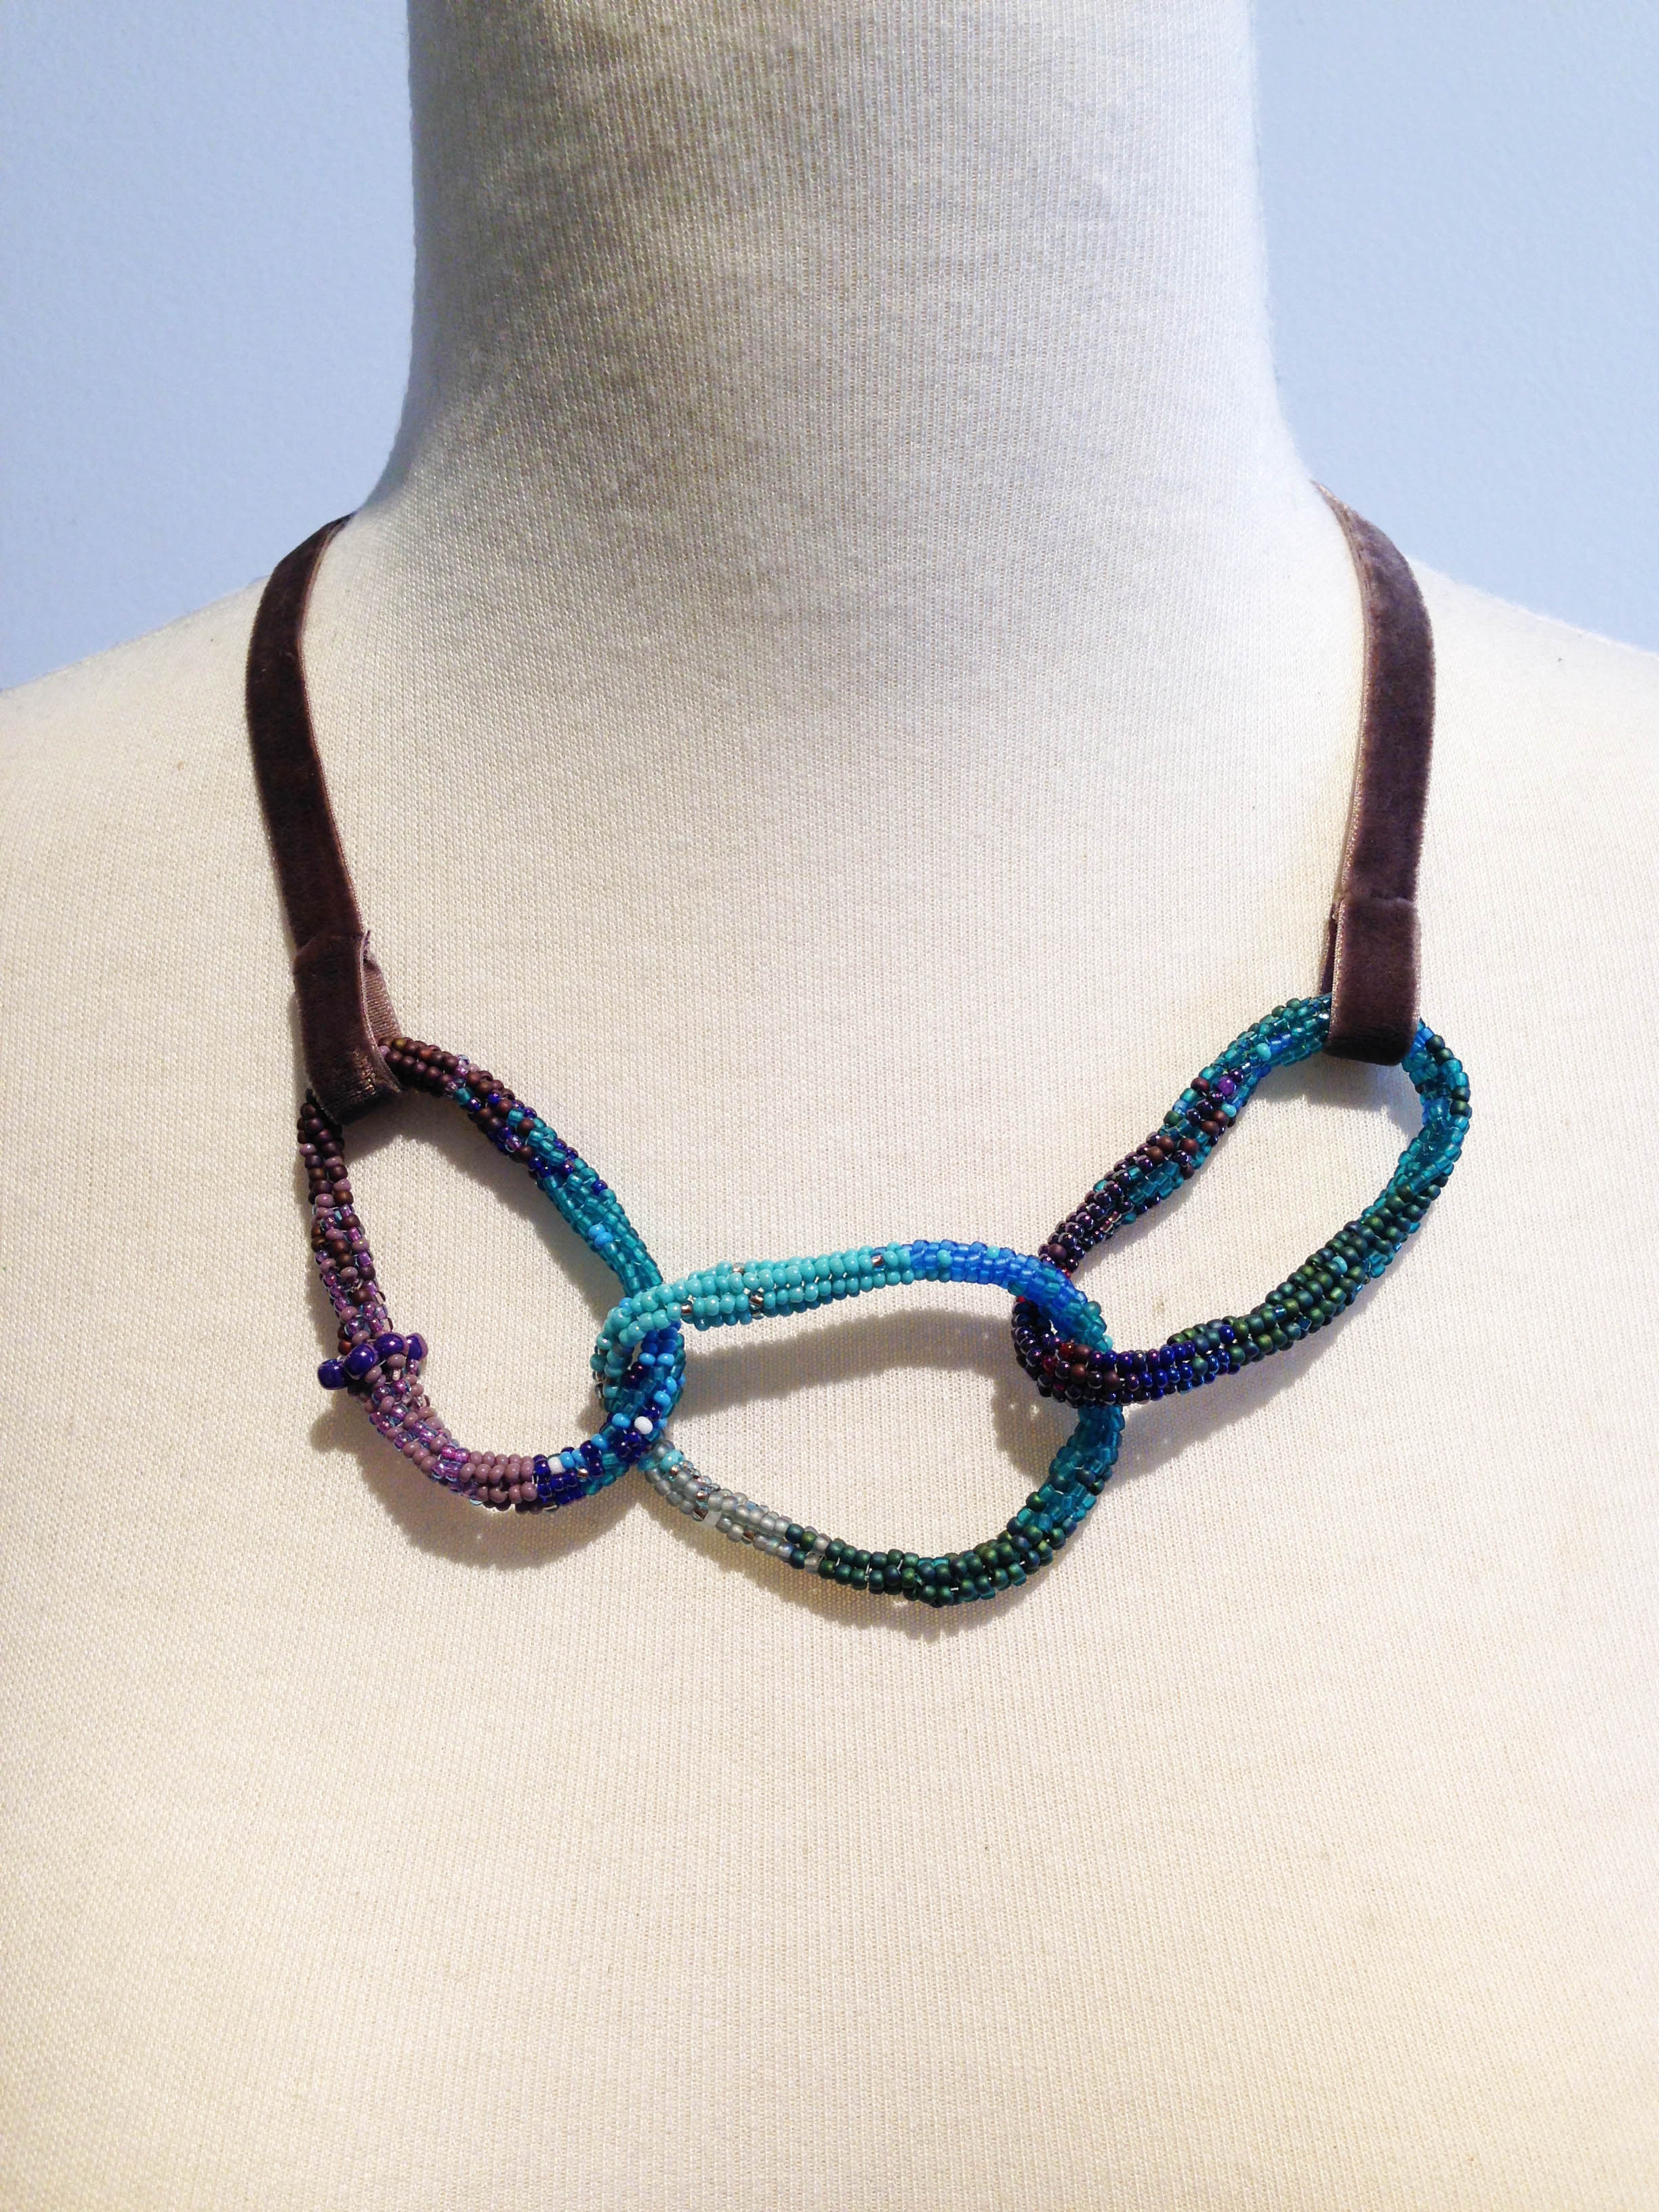 Velvet Tie Bracelet